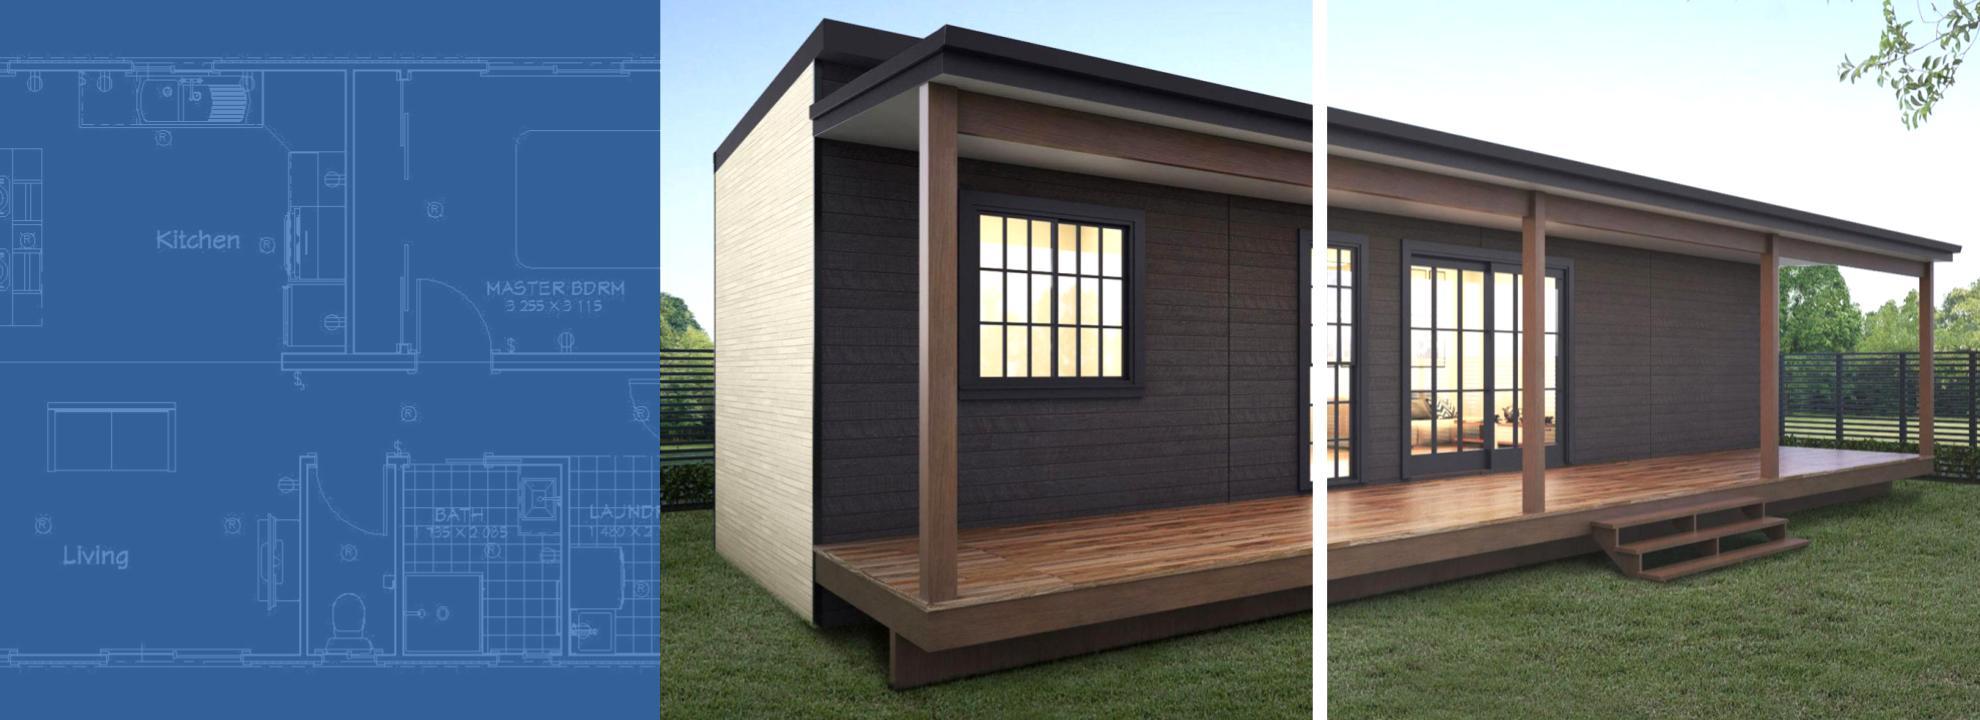 9x3 portable building granny flat tiny house